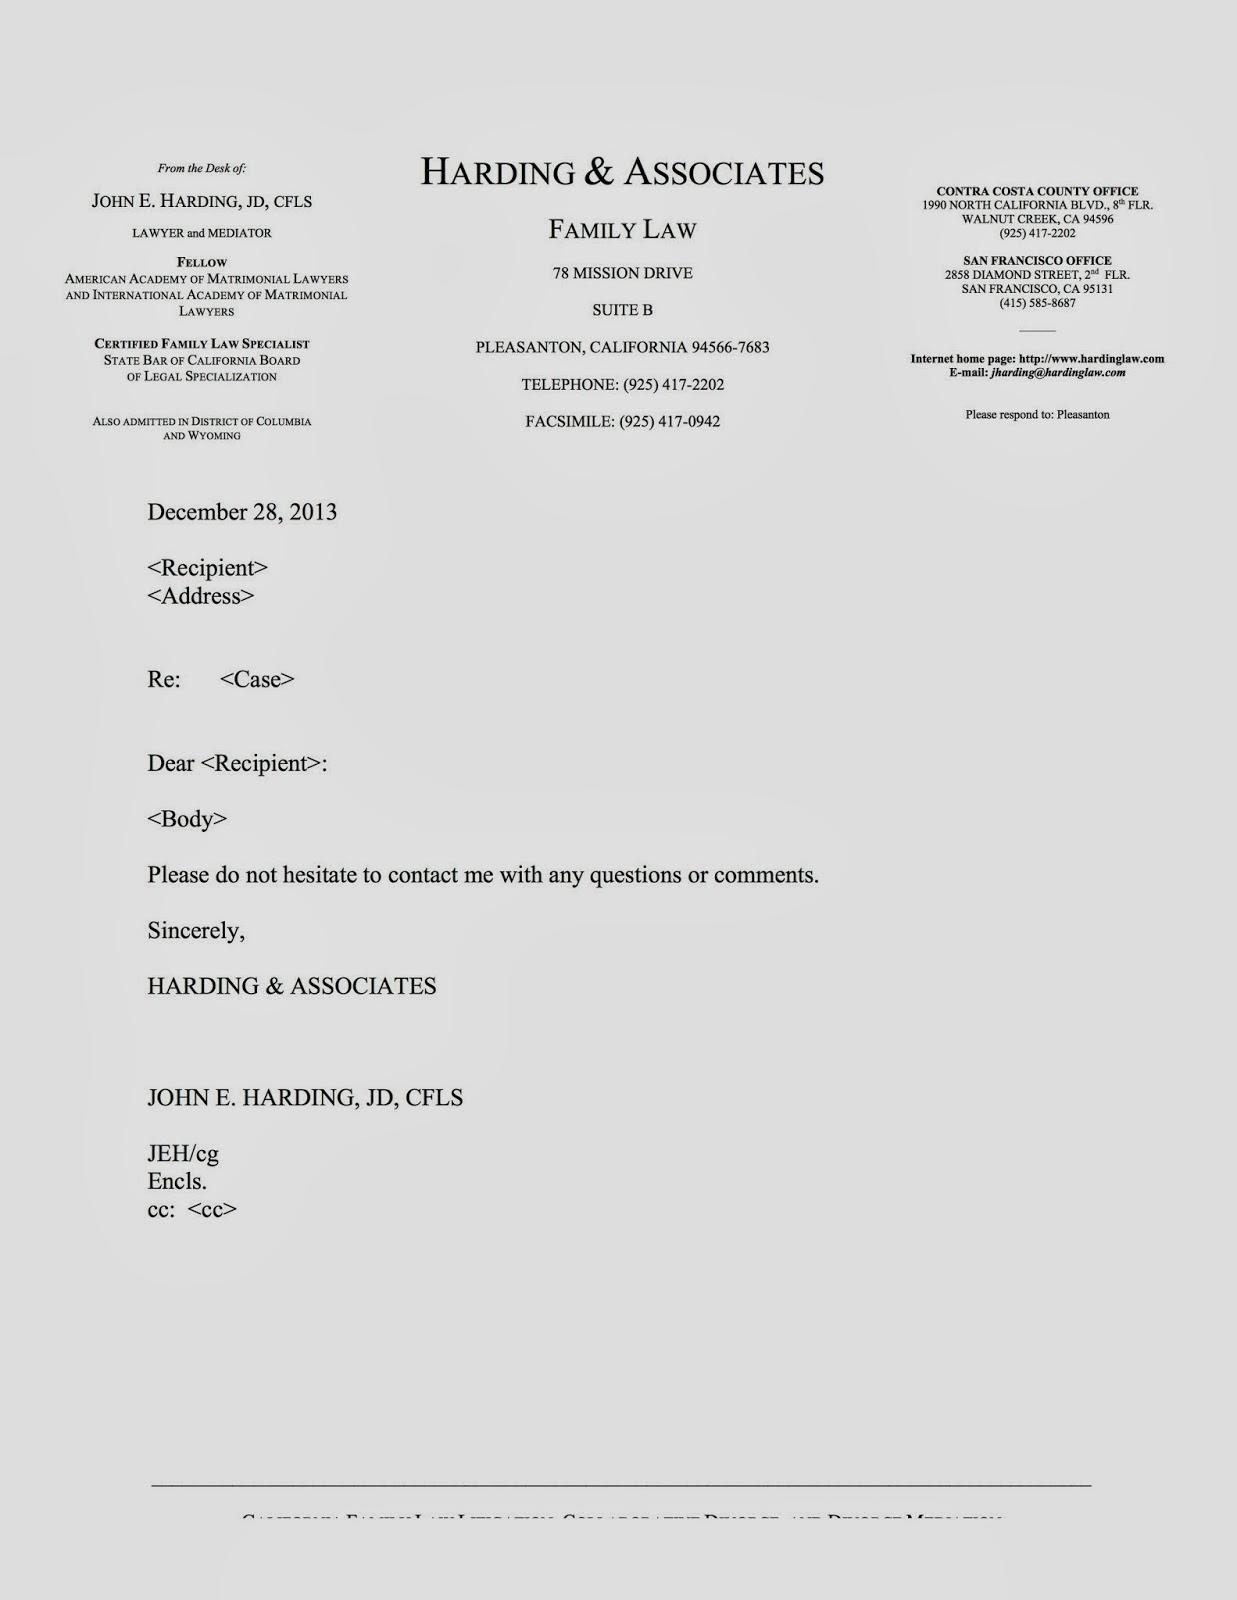 Download Legal Letterhead Templates